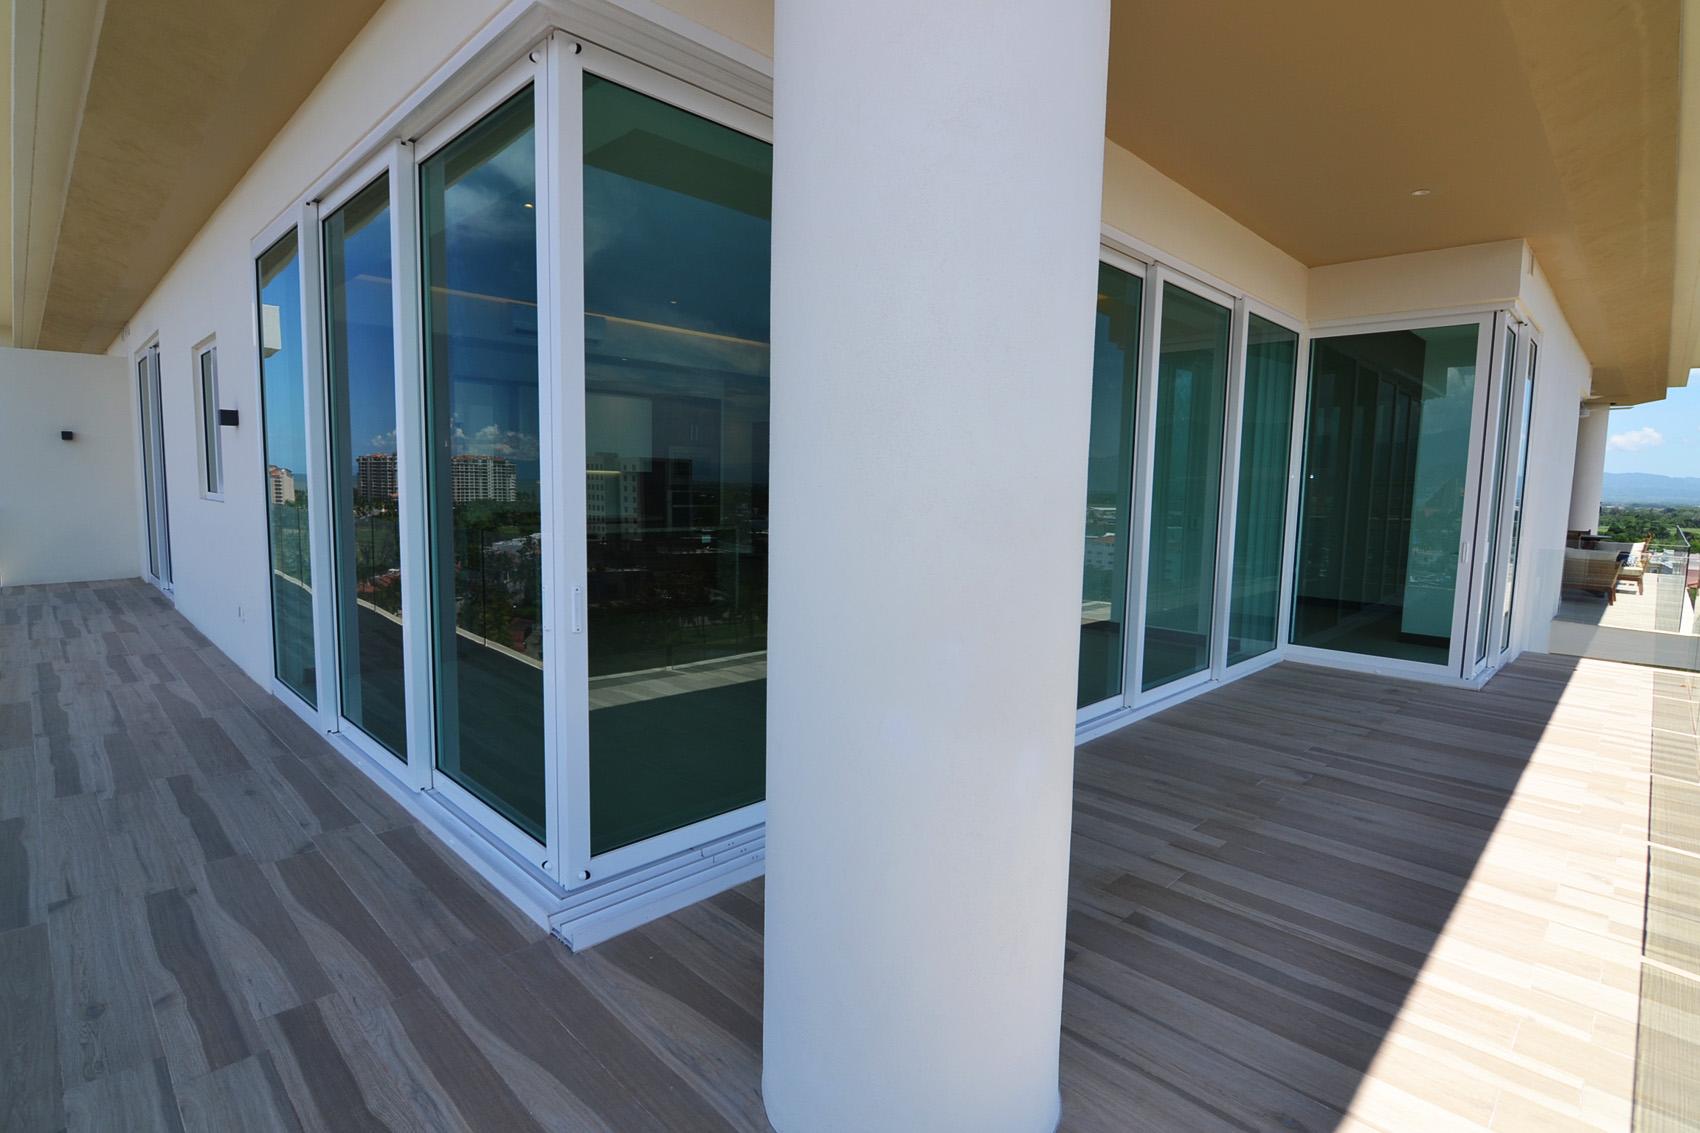 Condo VMarina PH10 - Puerto Vallarta Luxury Condo For Rent (35)